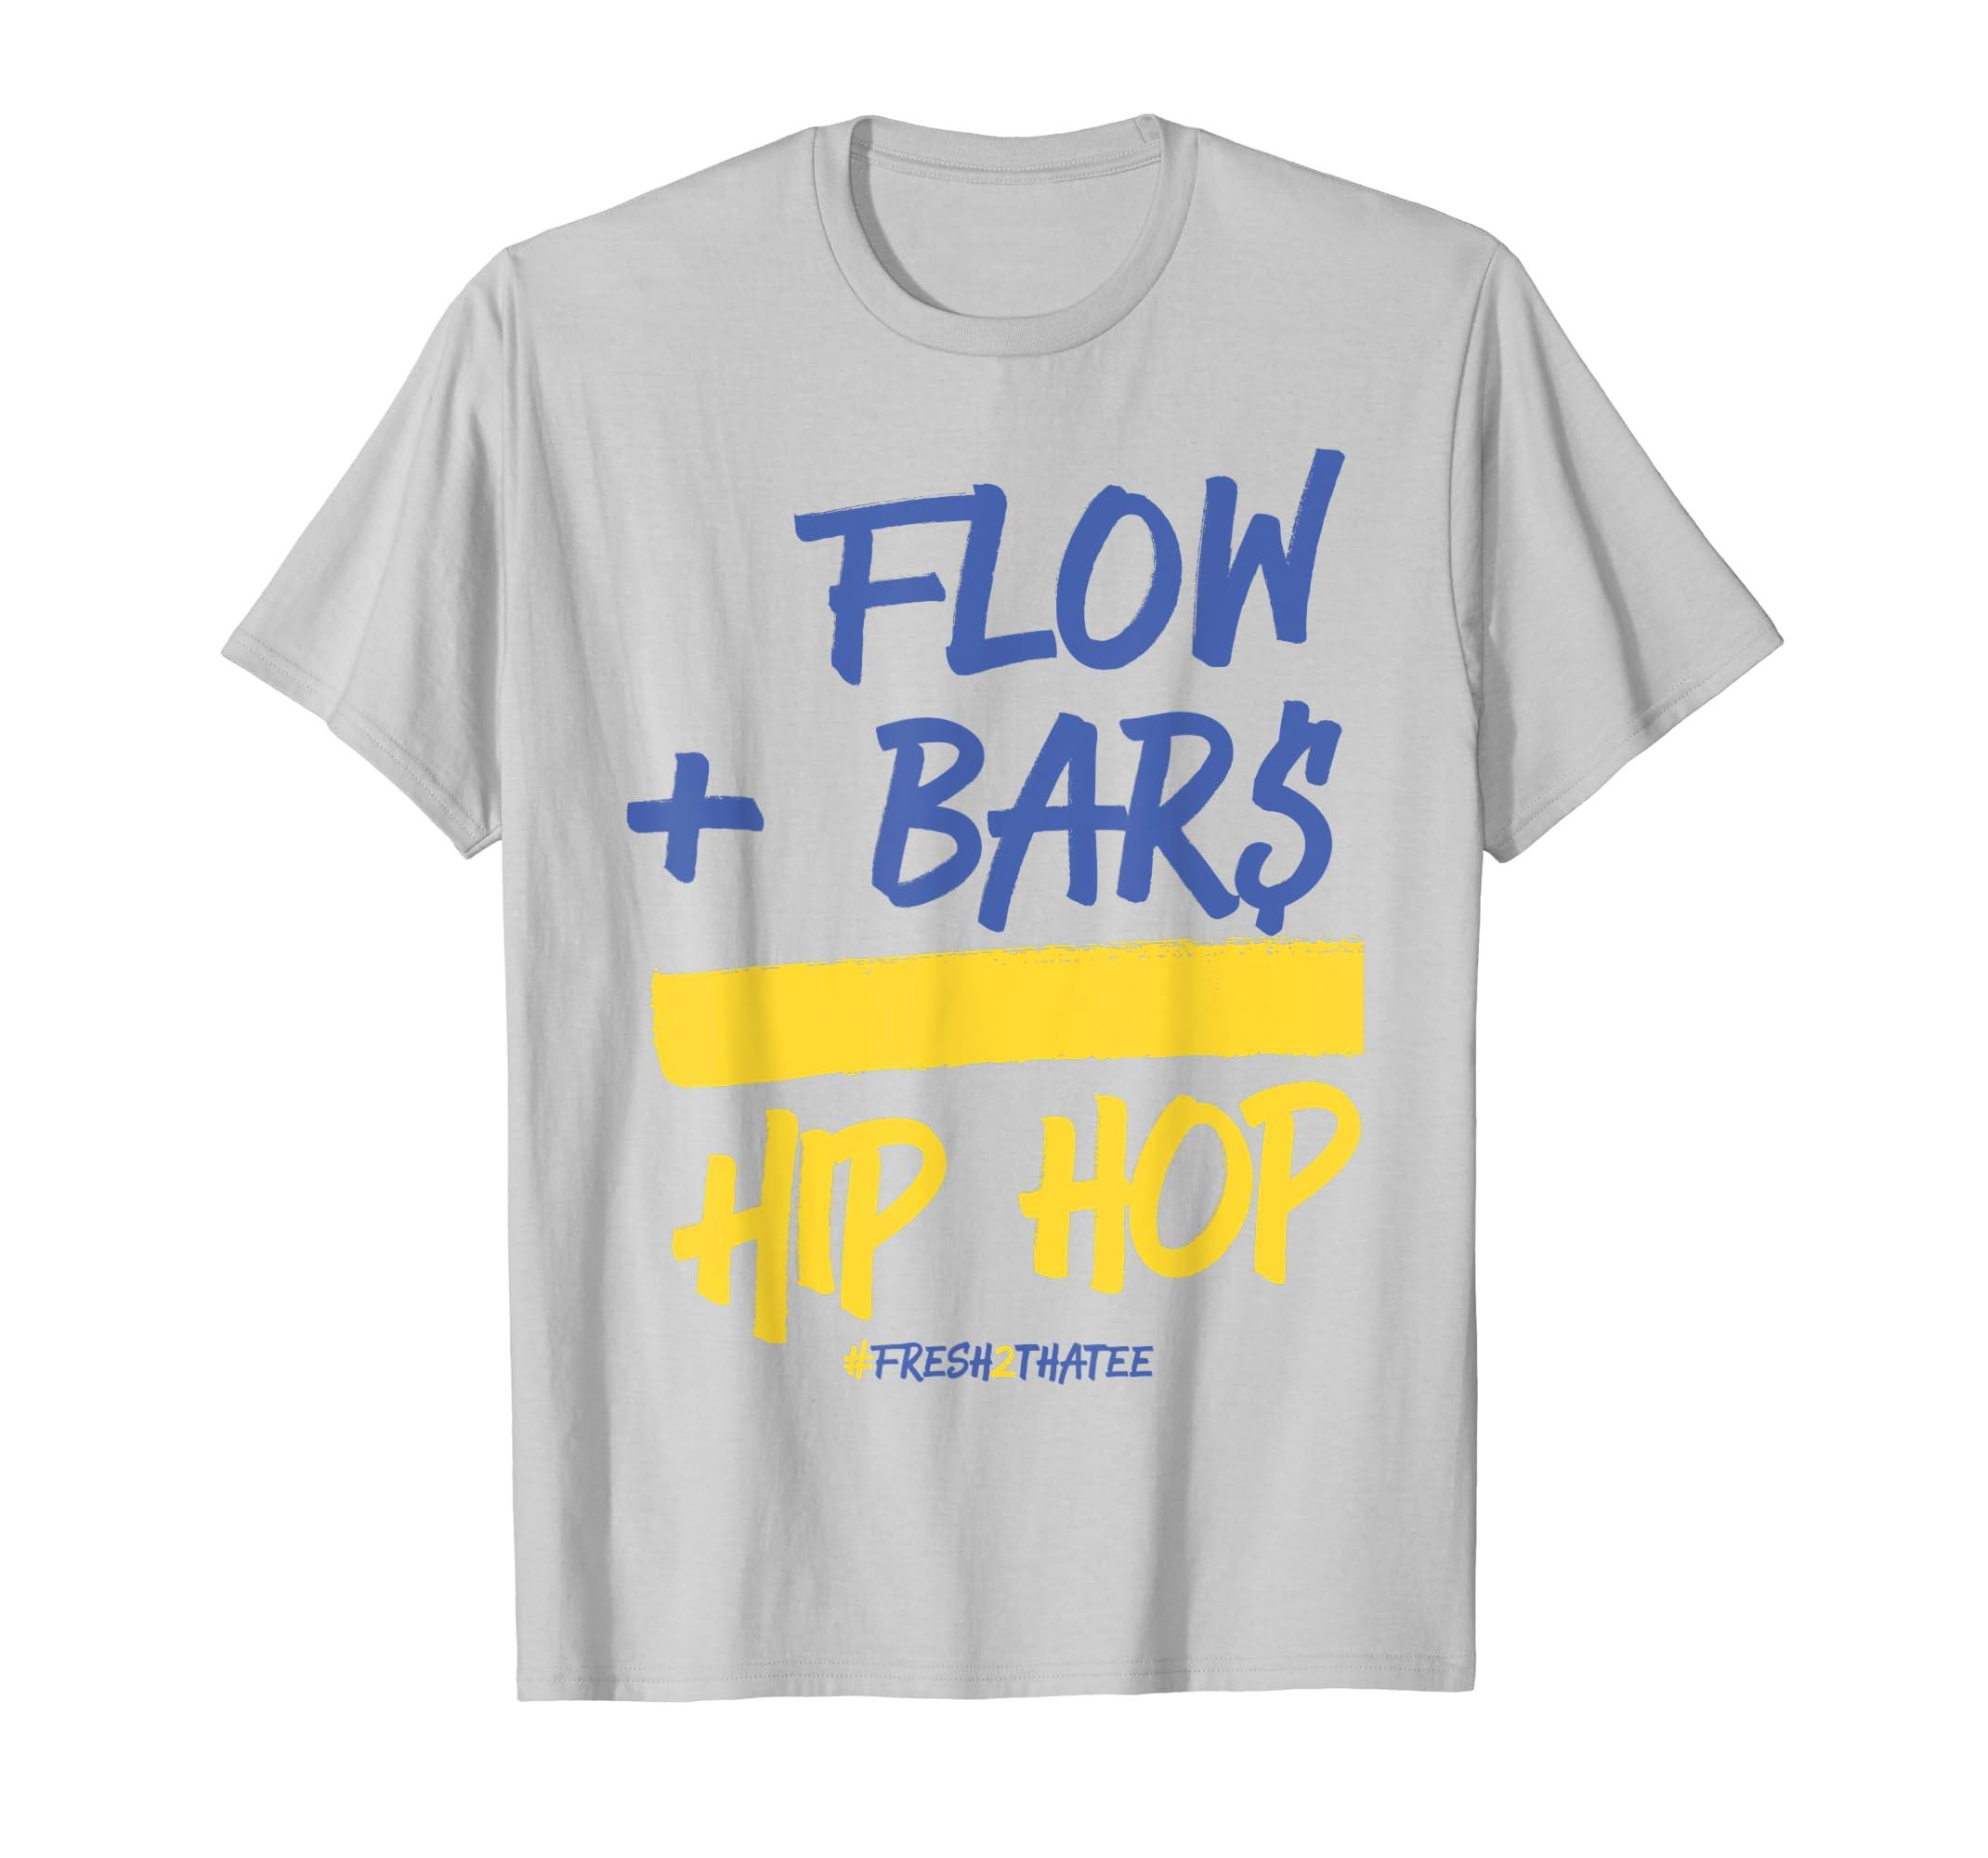 ecd9faa2a0ccdf Amazon.com  Hip hop shirt made to match Jordan 5 jsp laney  Clothing